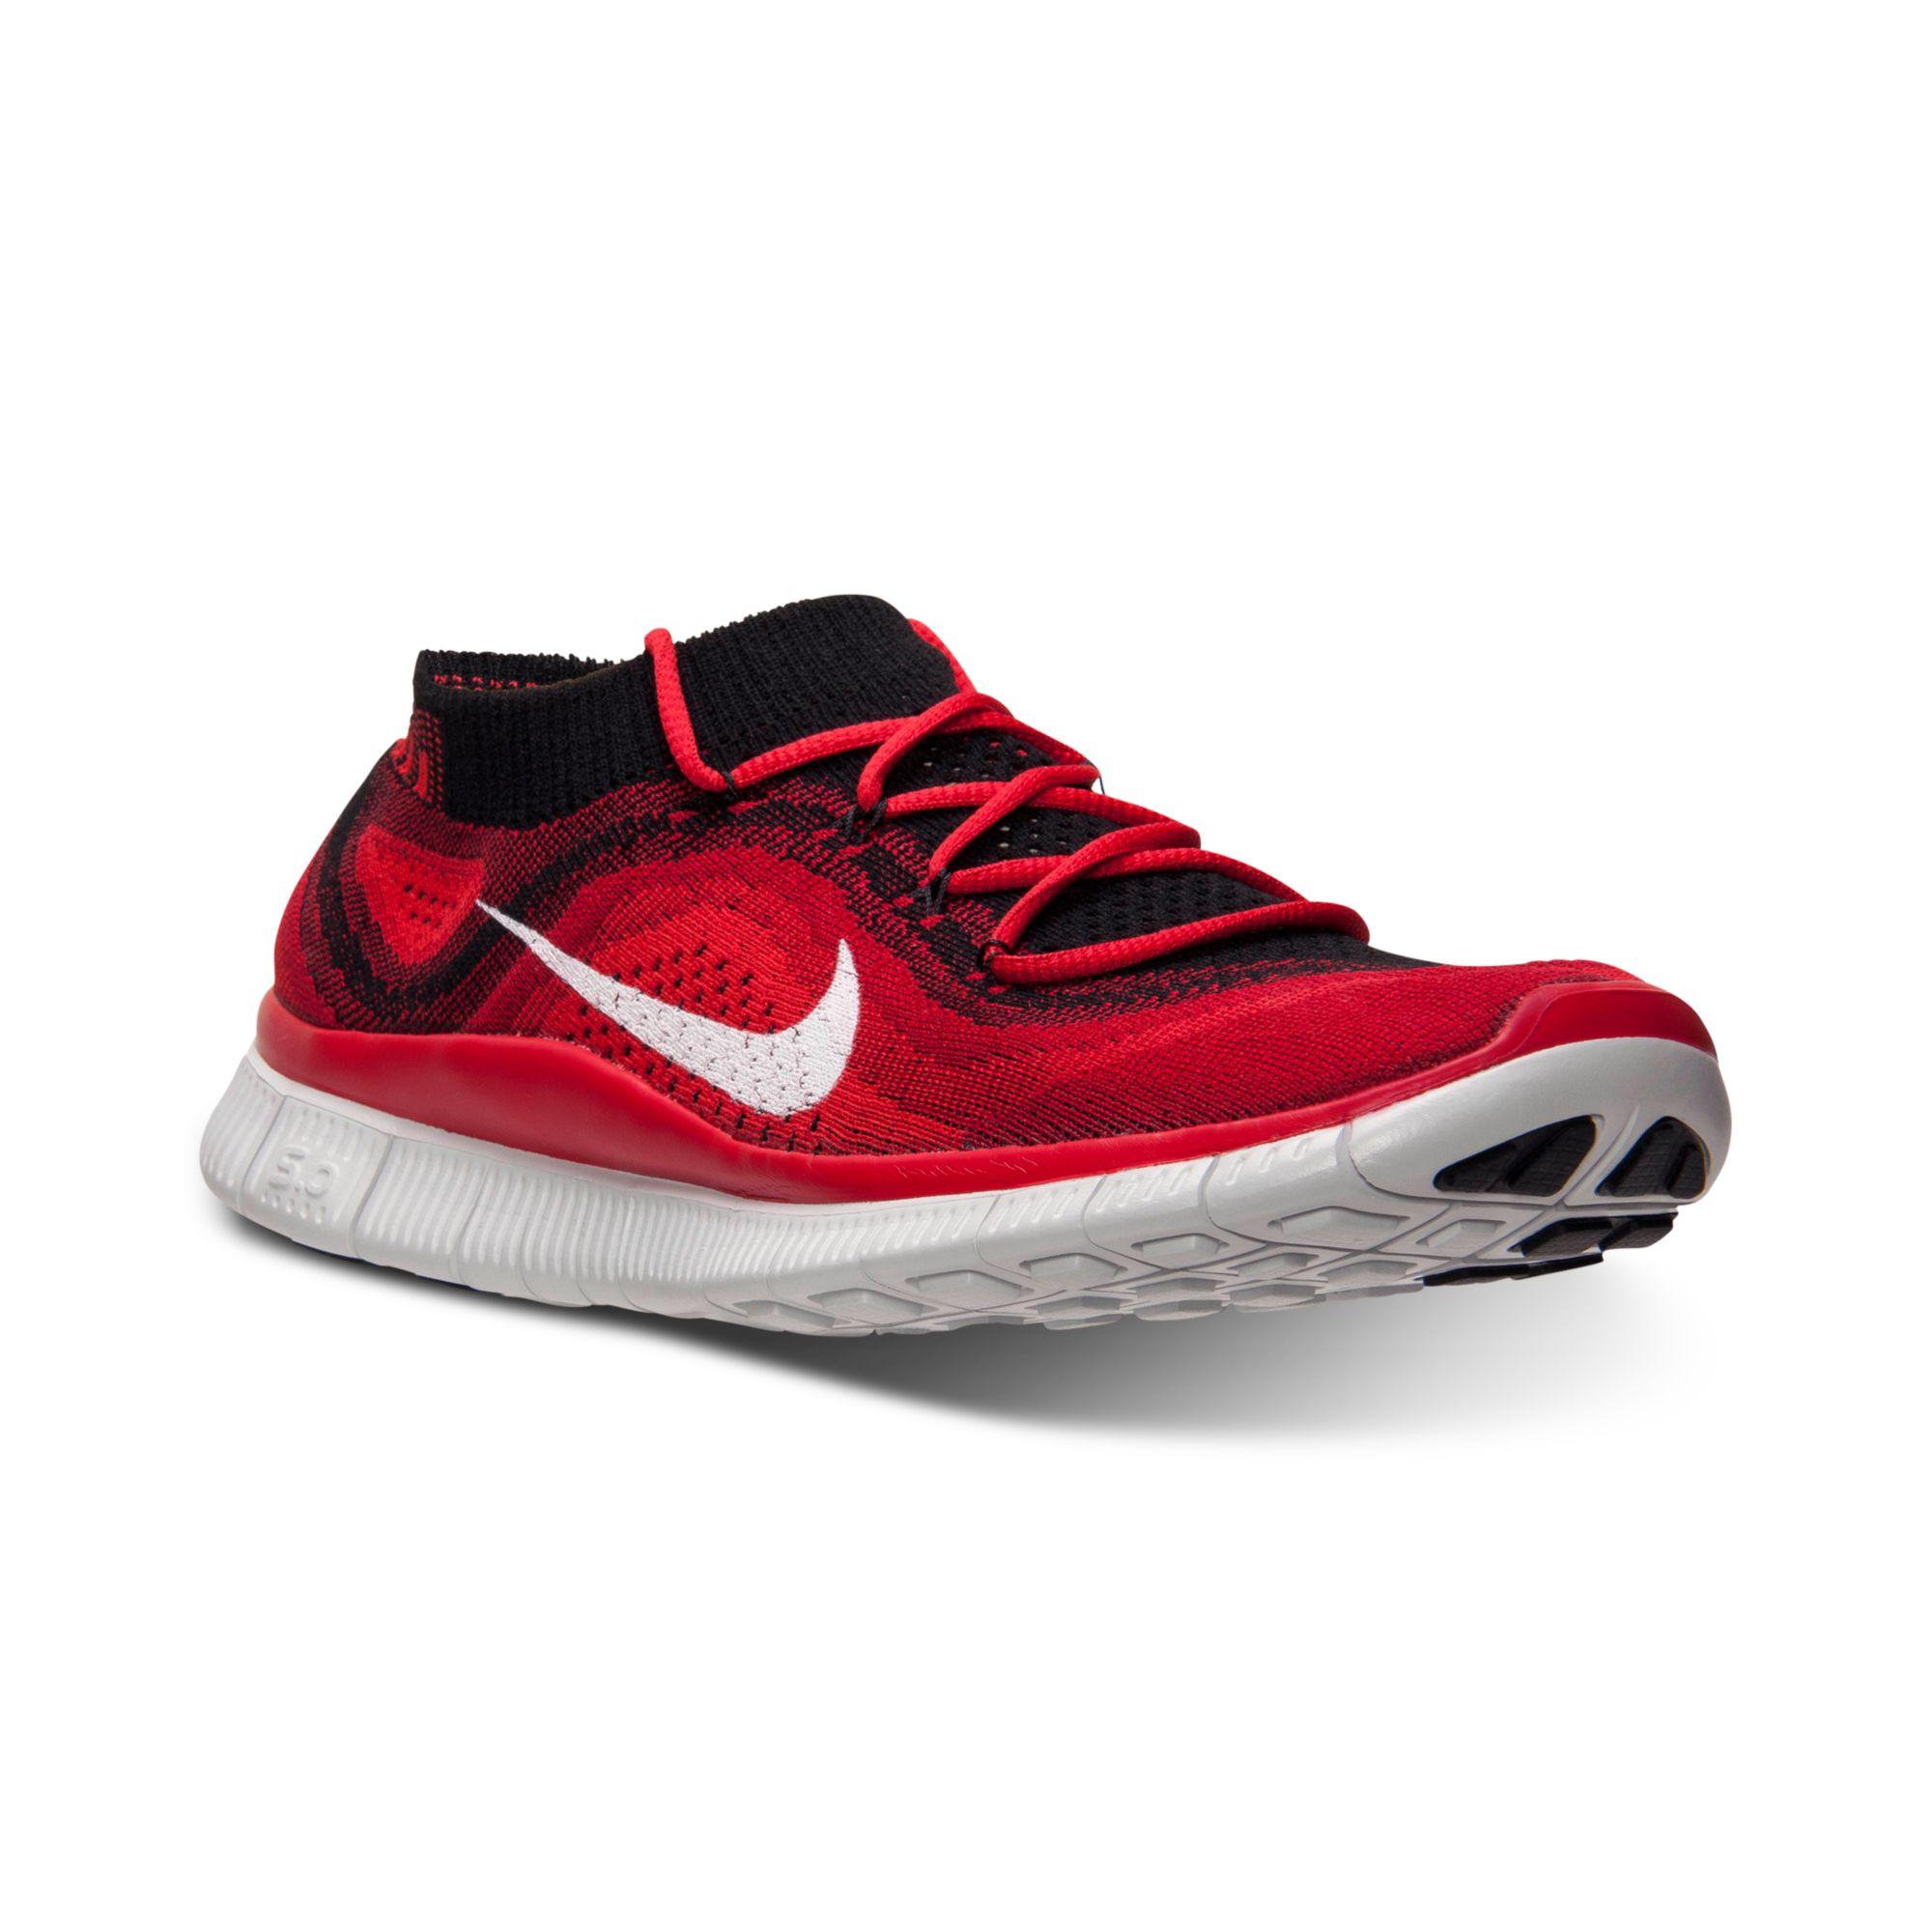 Finish Line Nike Shoes Running